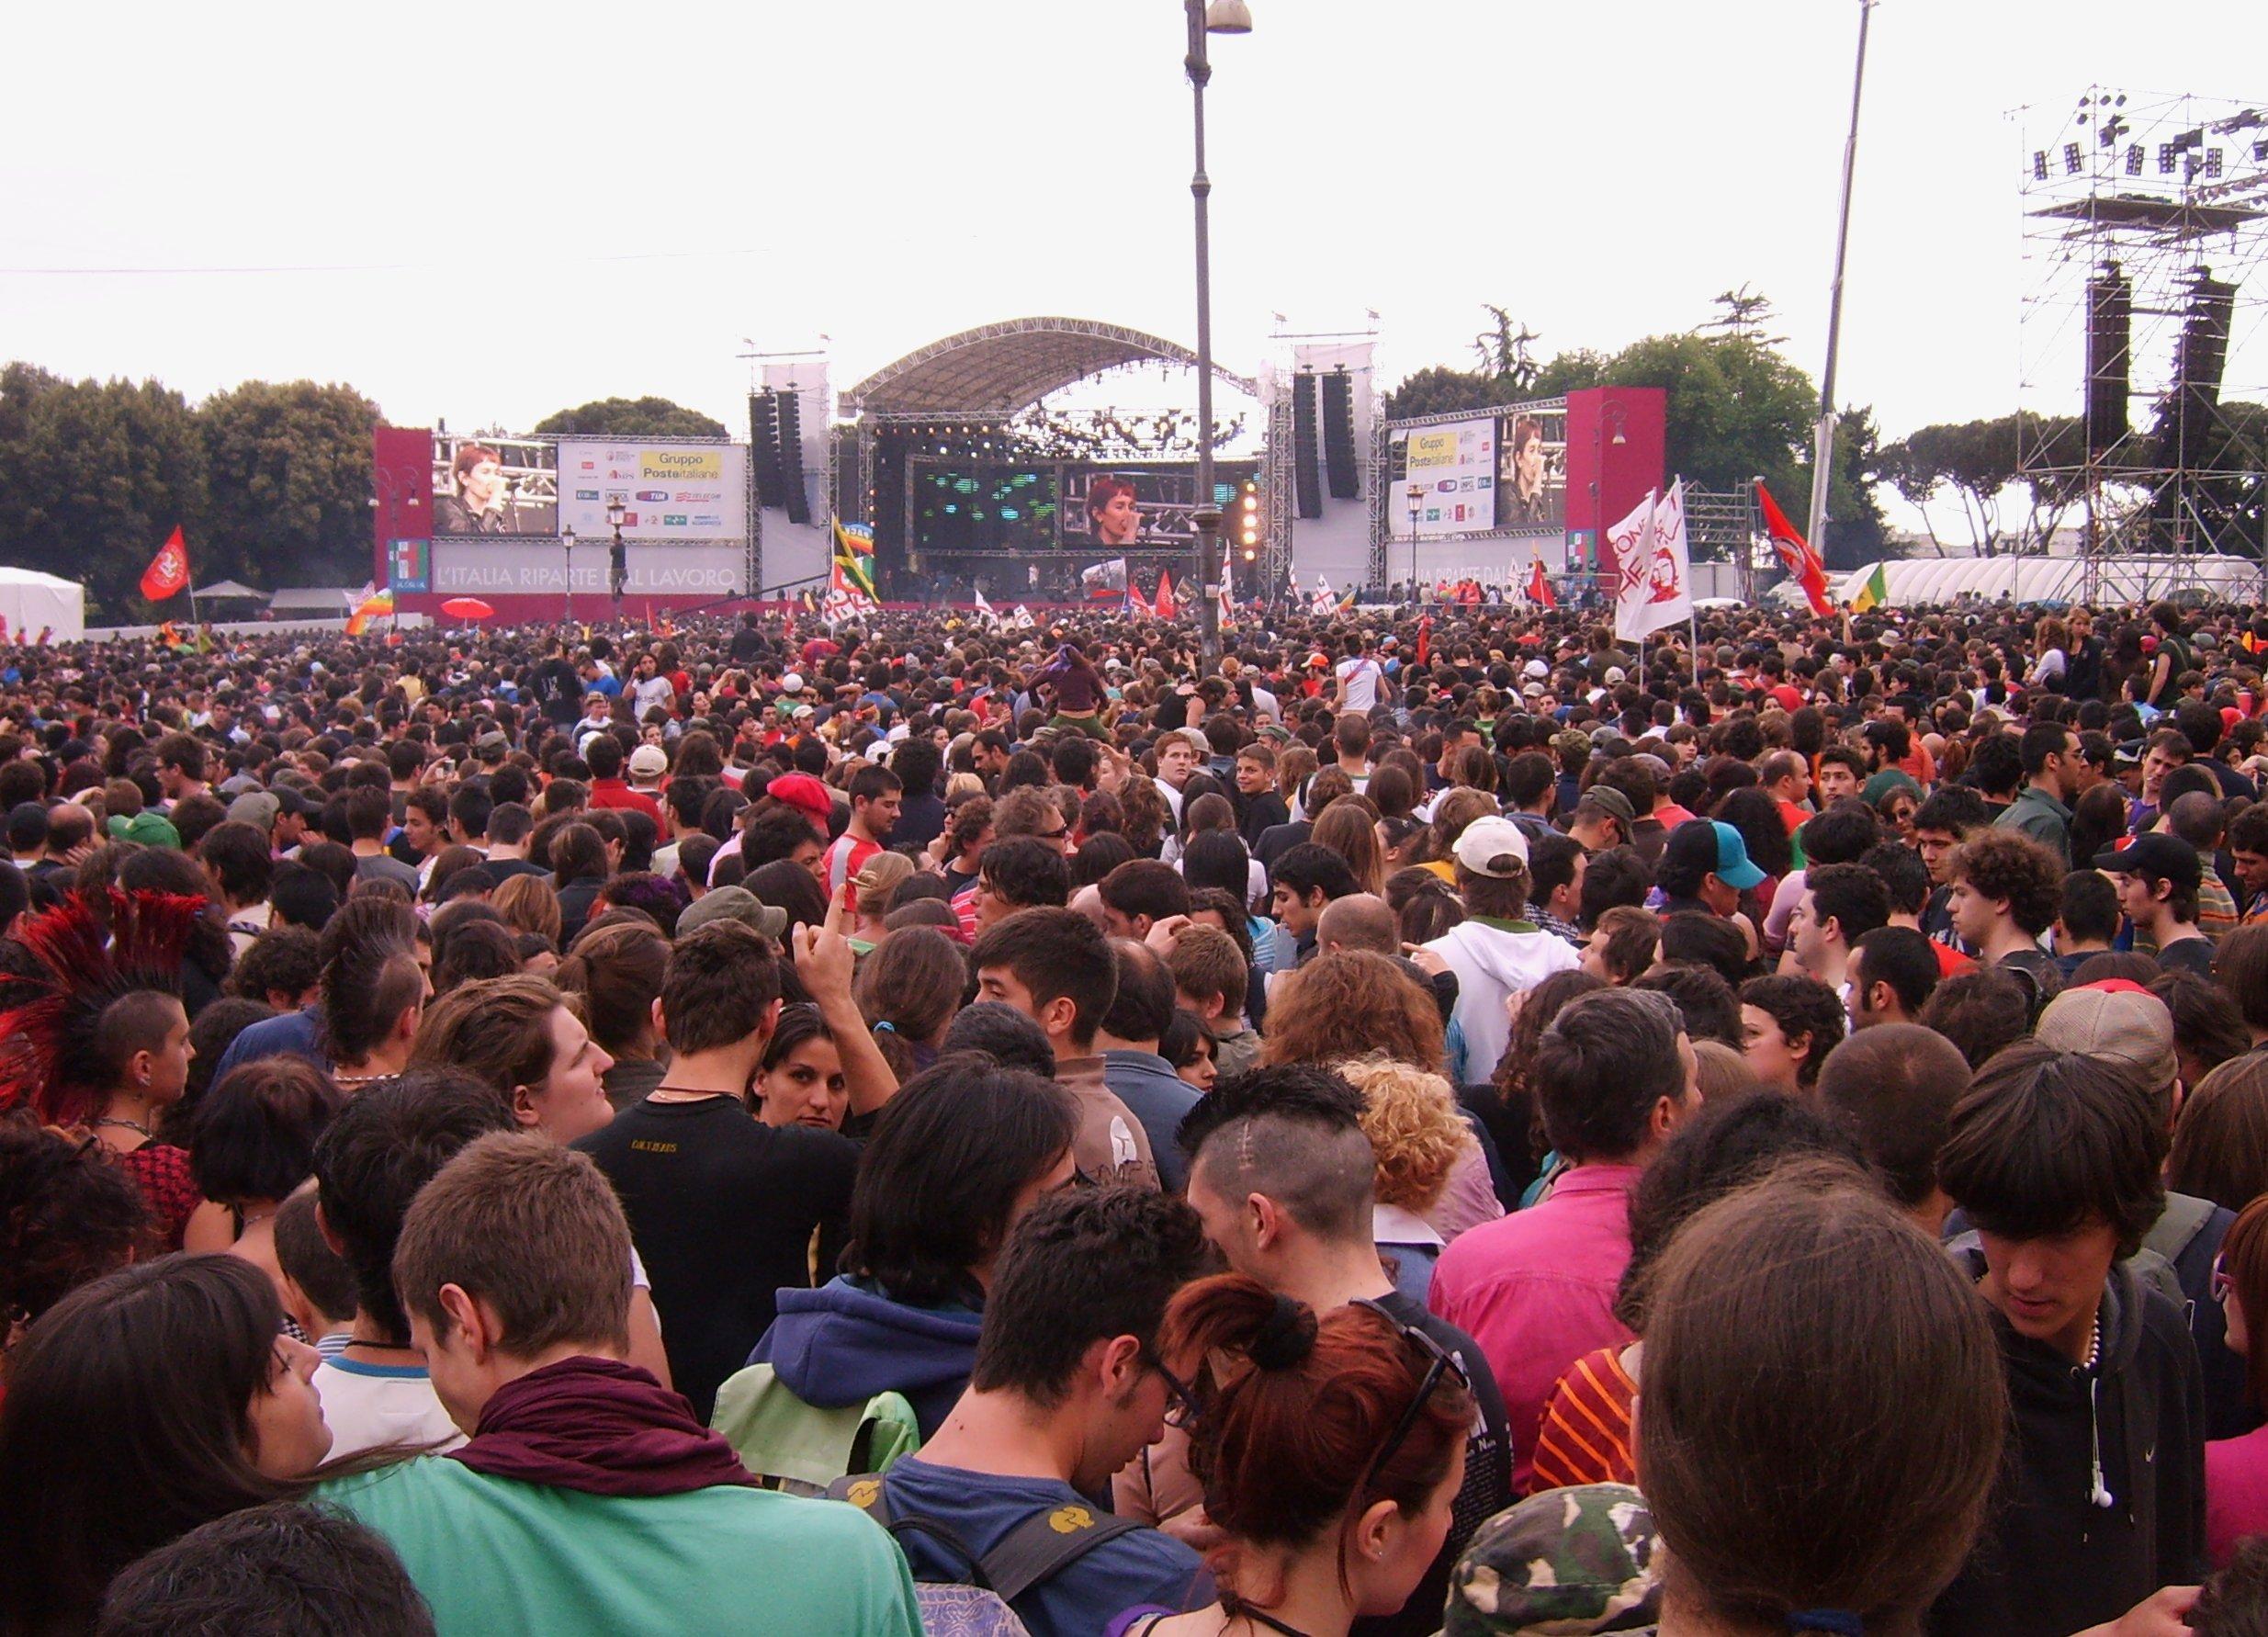 Rome_concert_1-5-2007_crowd